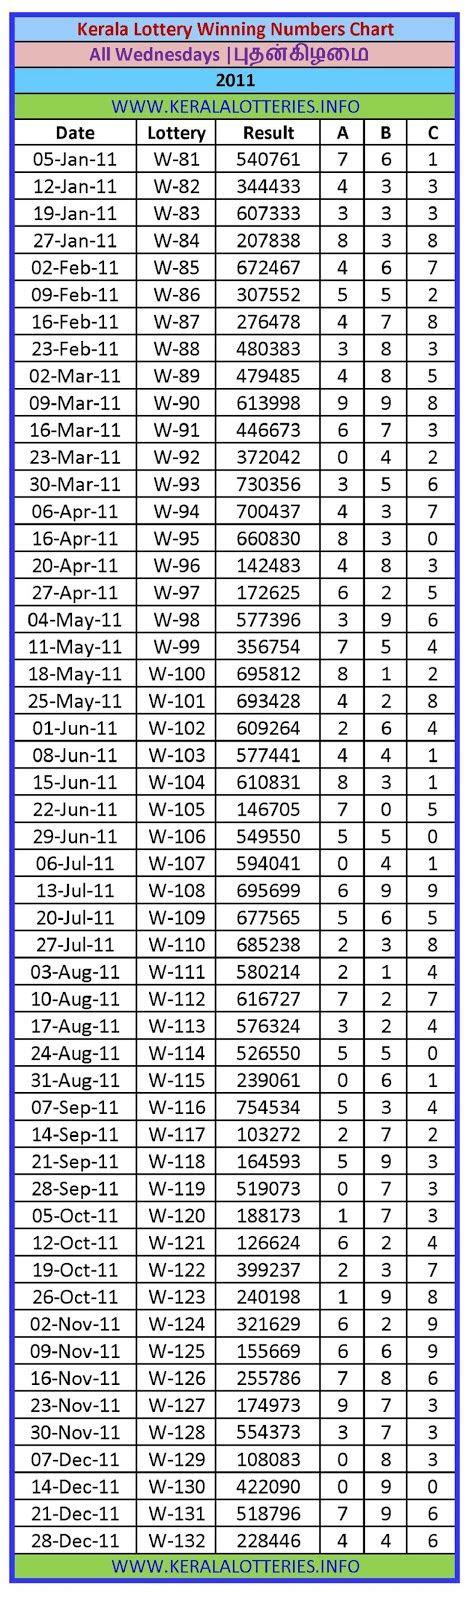 wednesday charts kerala lottery winning numbers